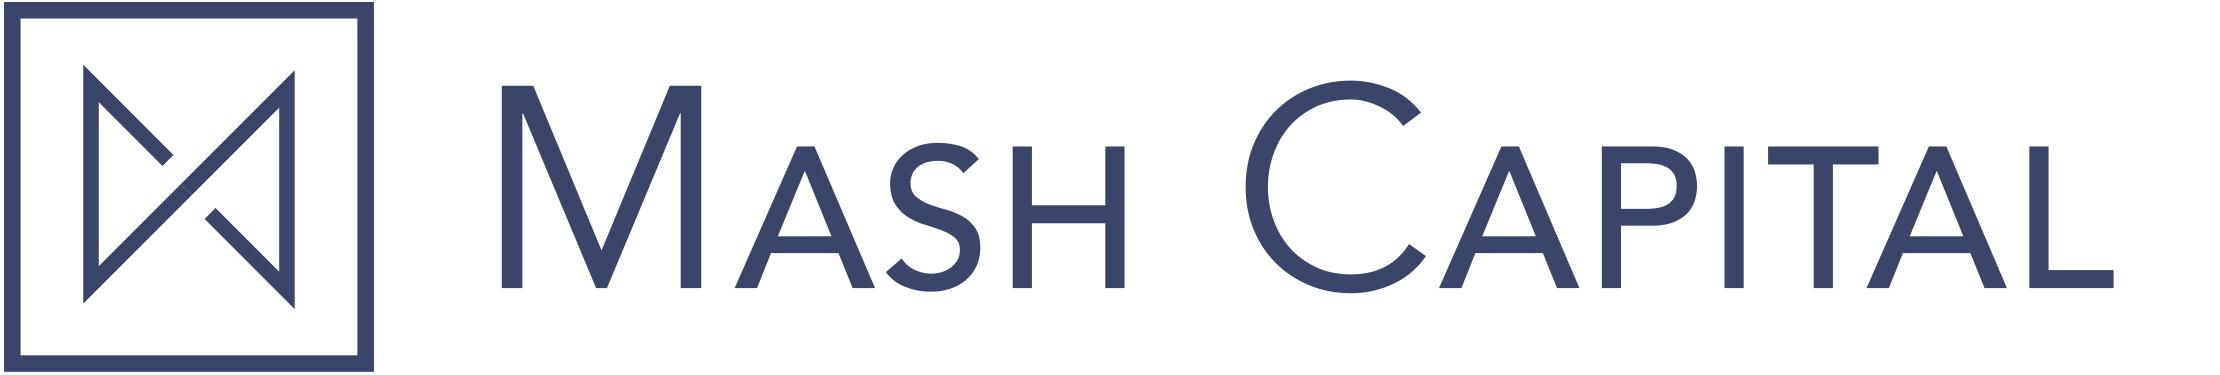 Mash capital invest india international - Mwh global uk head office ...